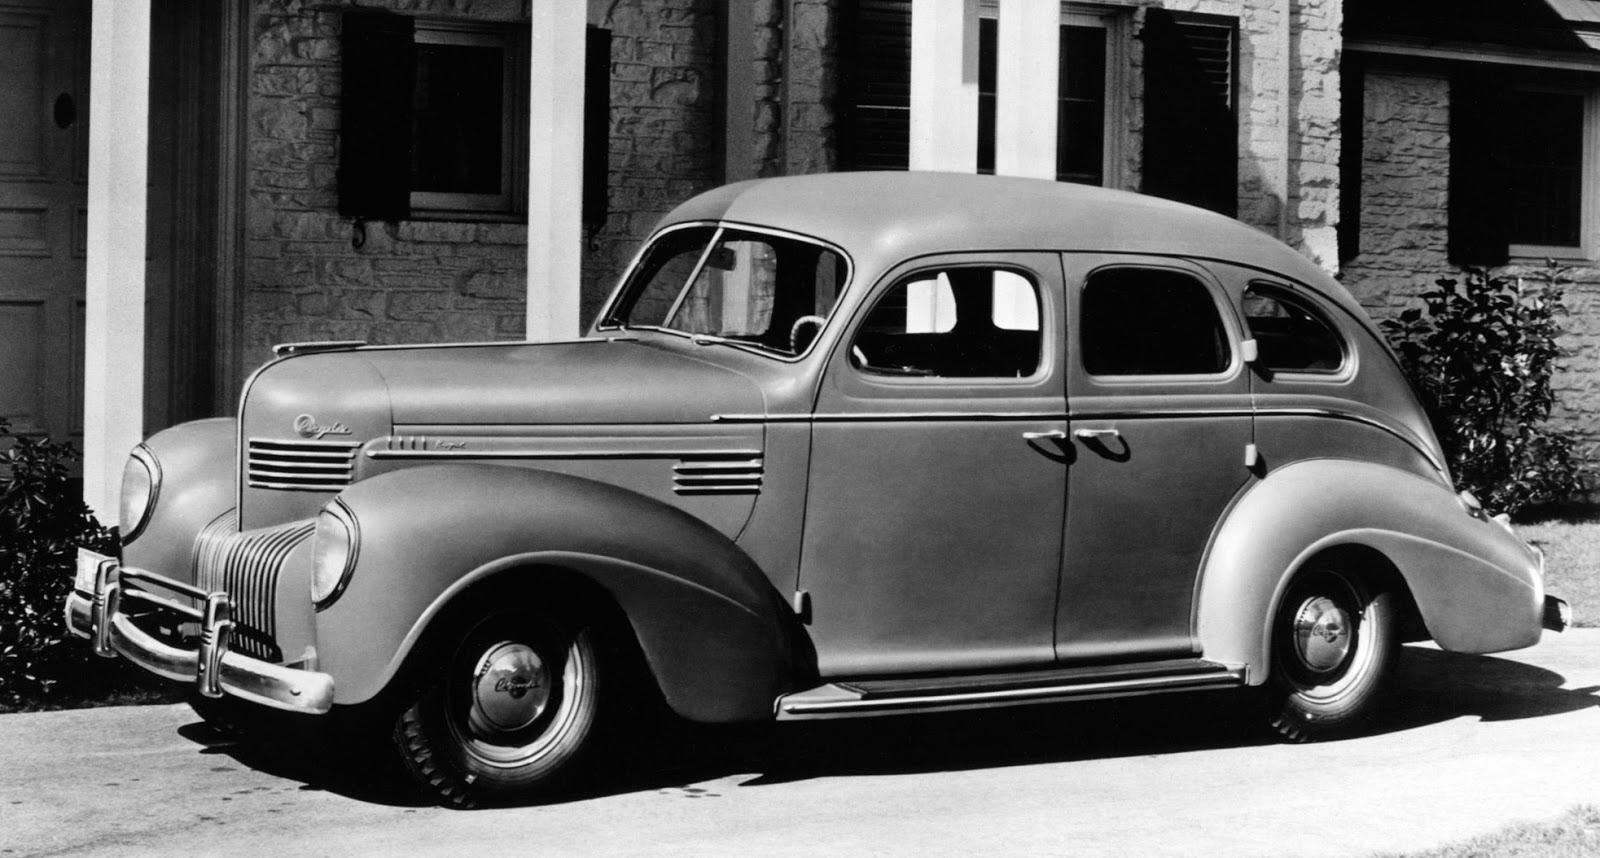 1939 Chrysler Royal Coupe 1939 Chrysler Model C 22 Royal